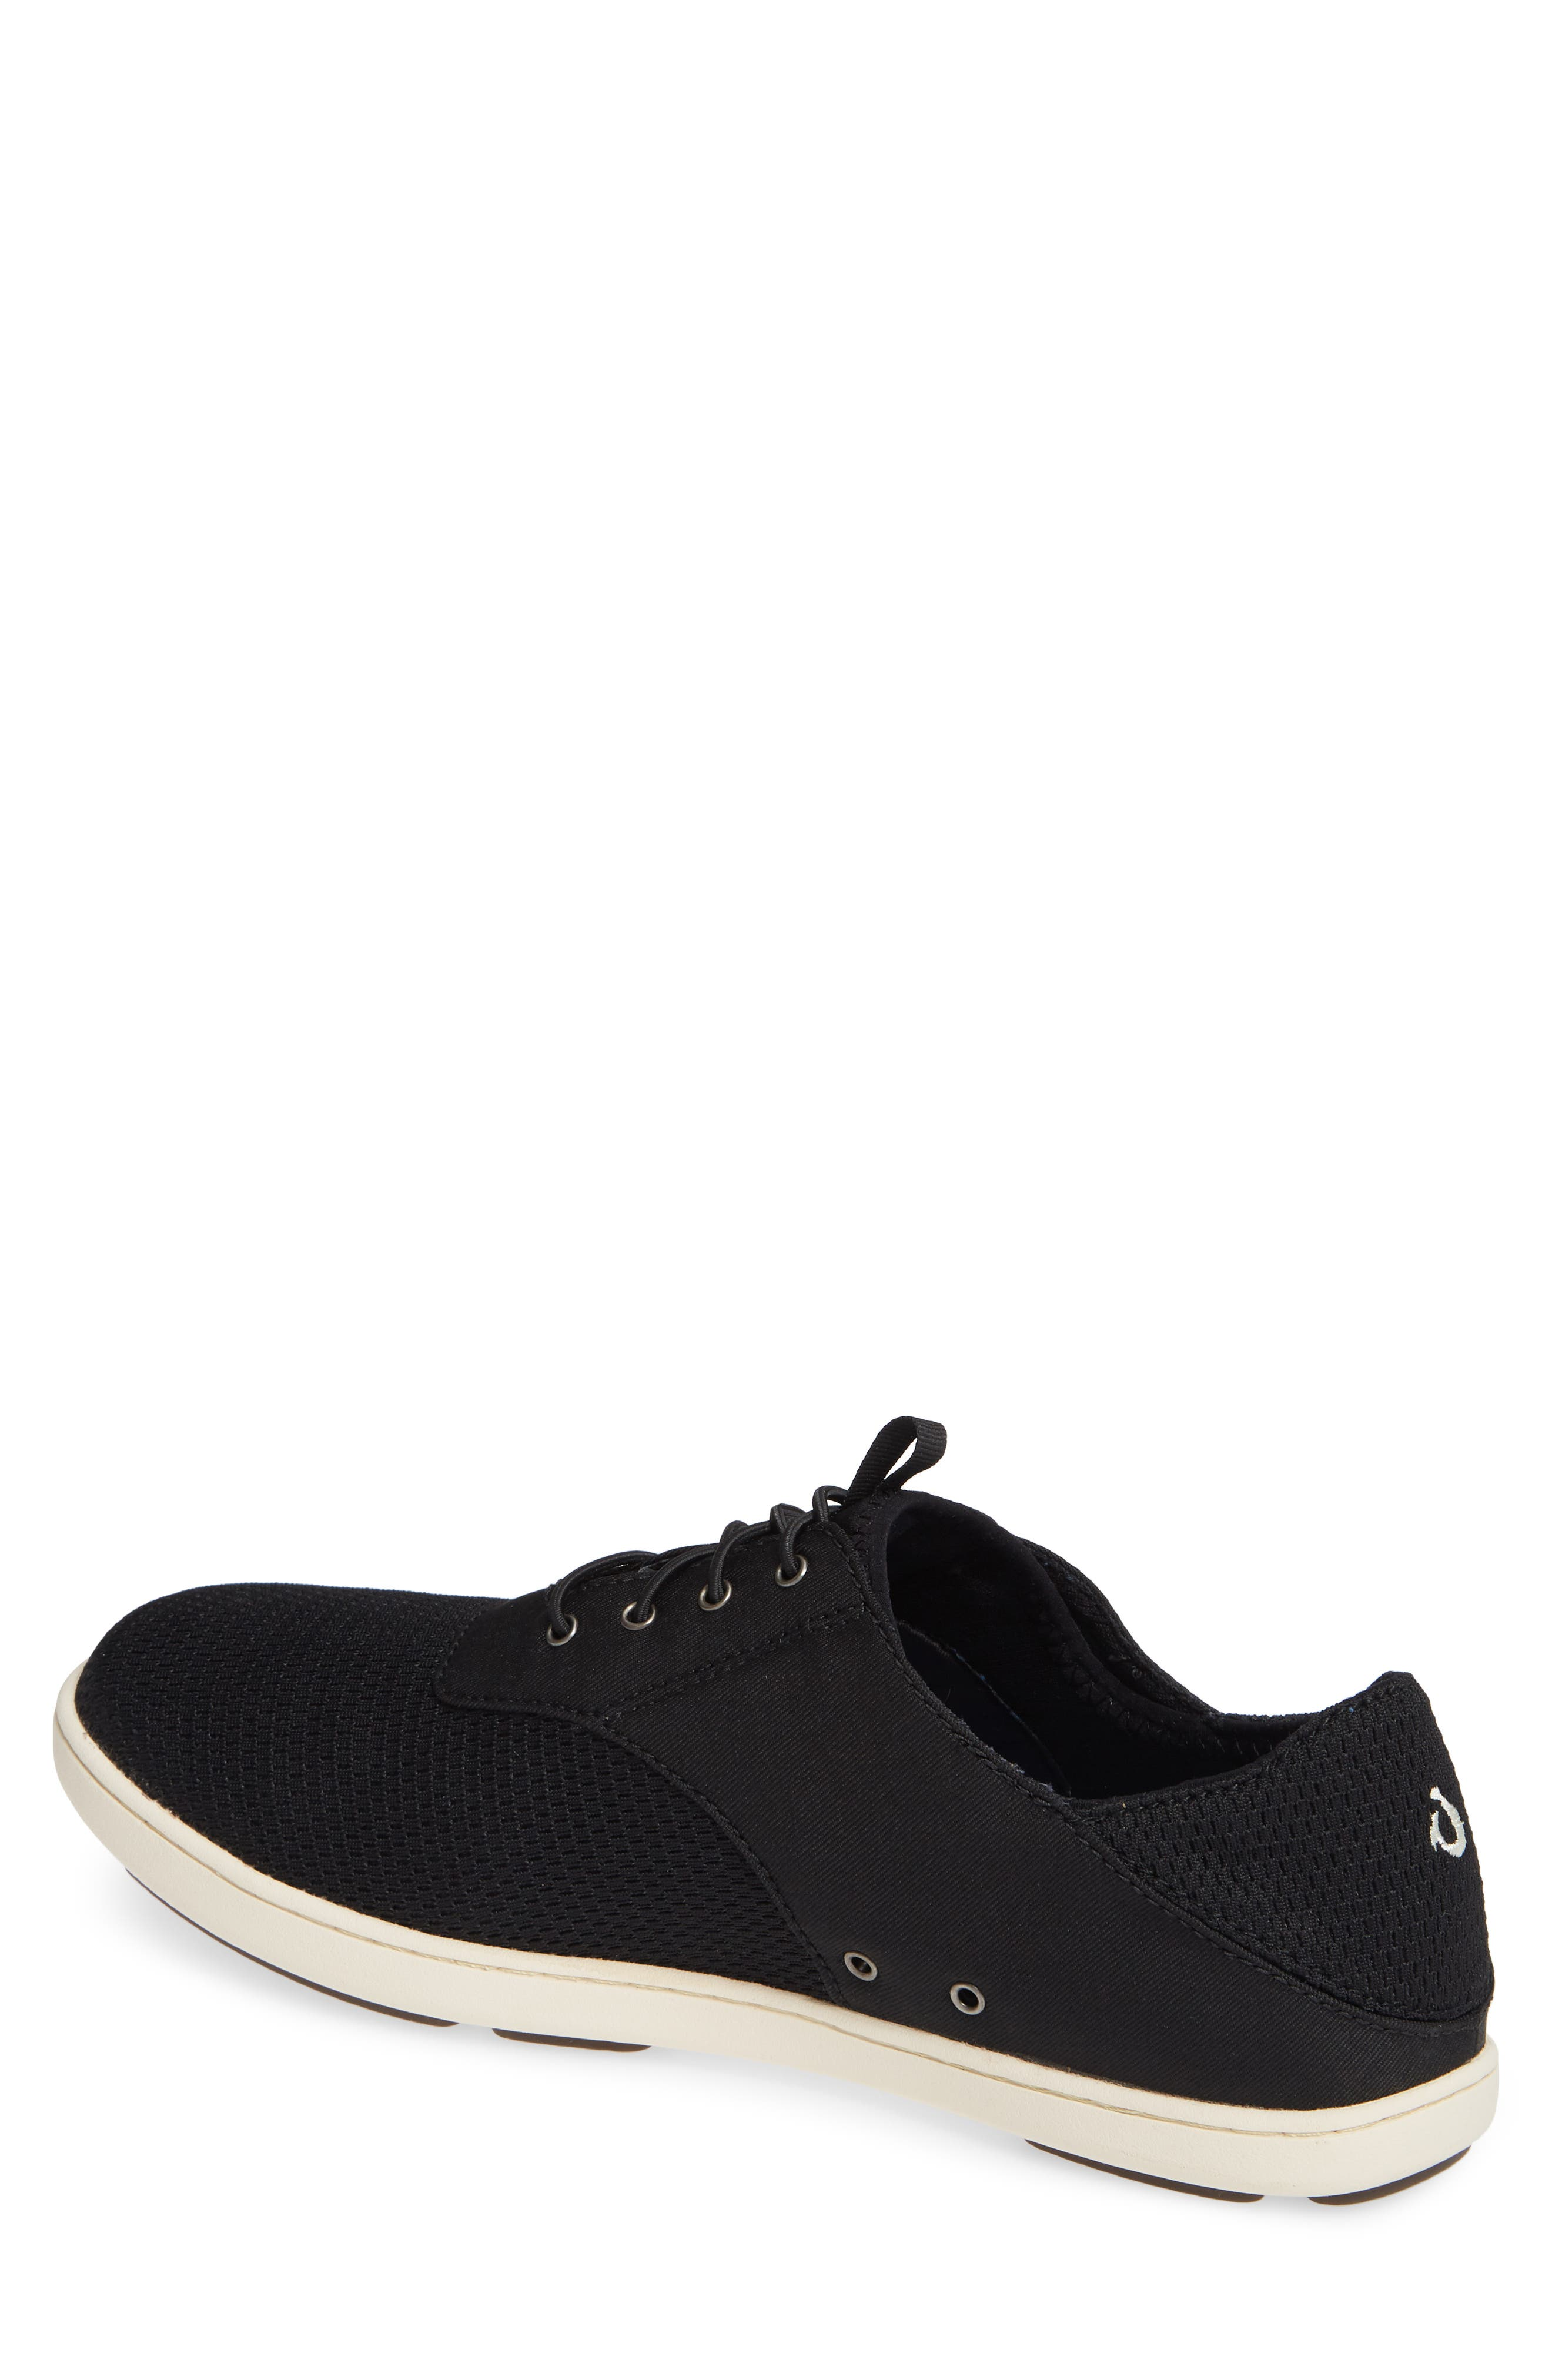 Nohea Moku Sneaker,                             Alternate thumbnail 2, color,                             ONYX/ ONYX TEXTILE